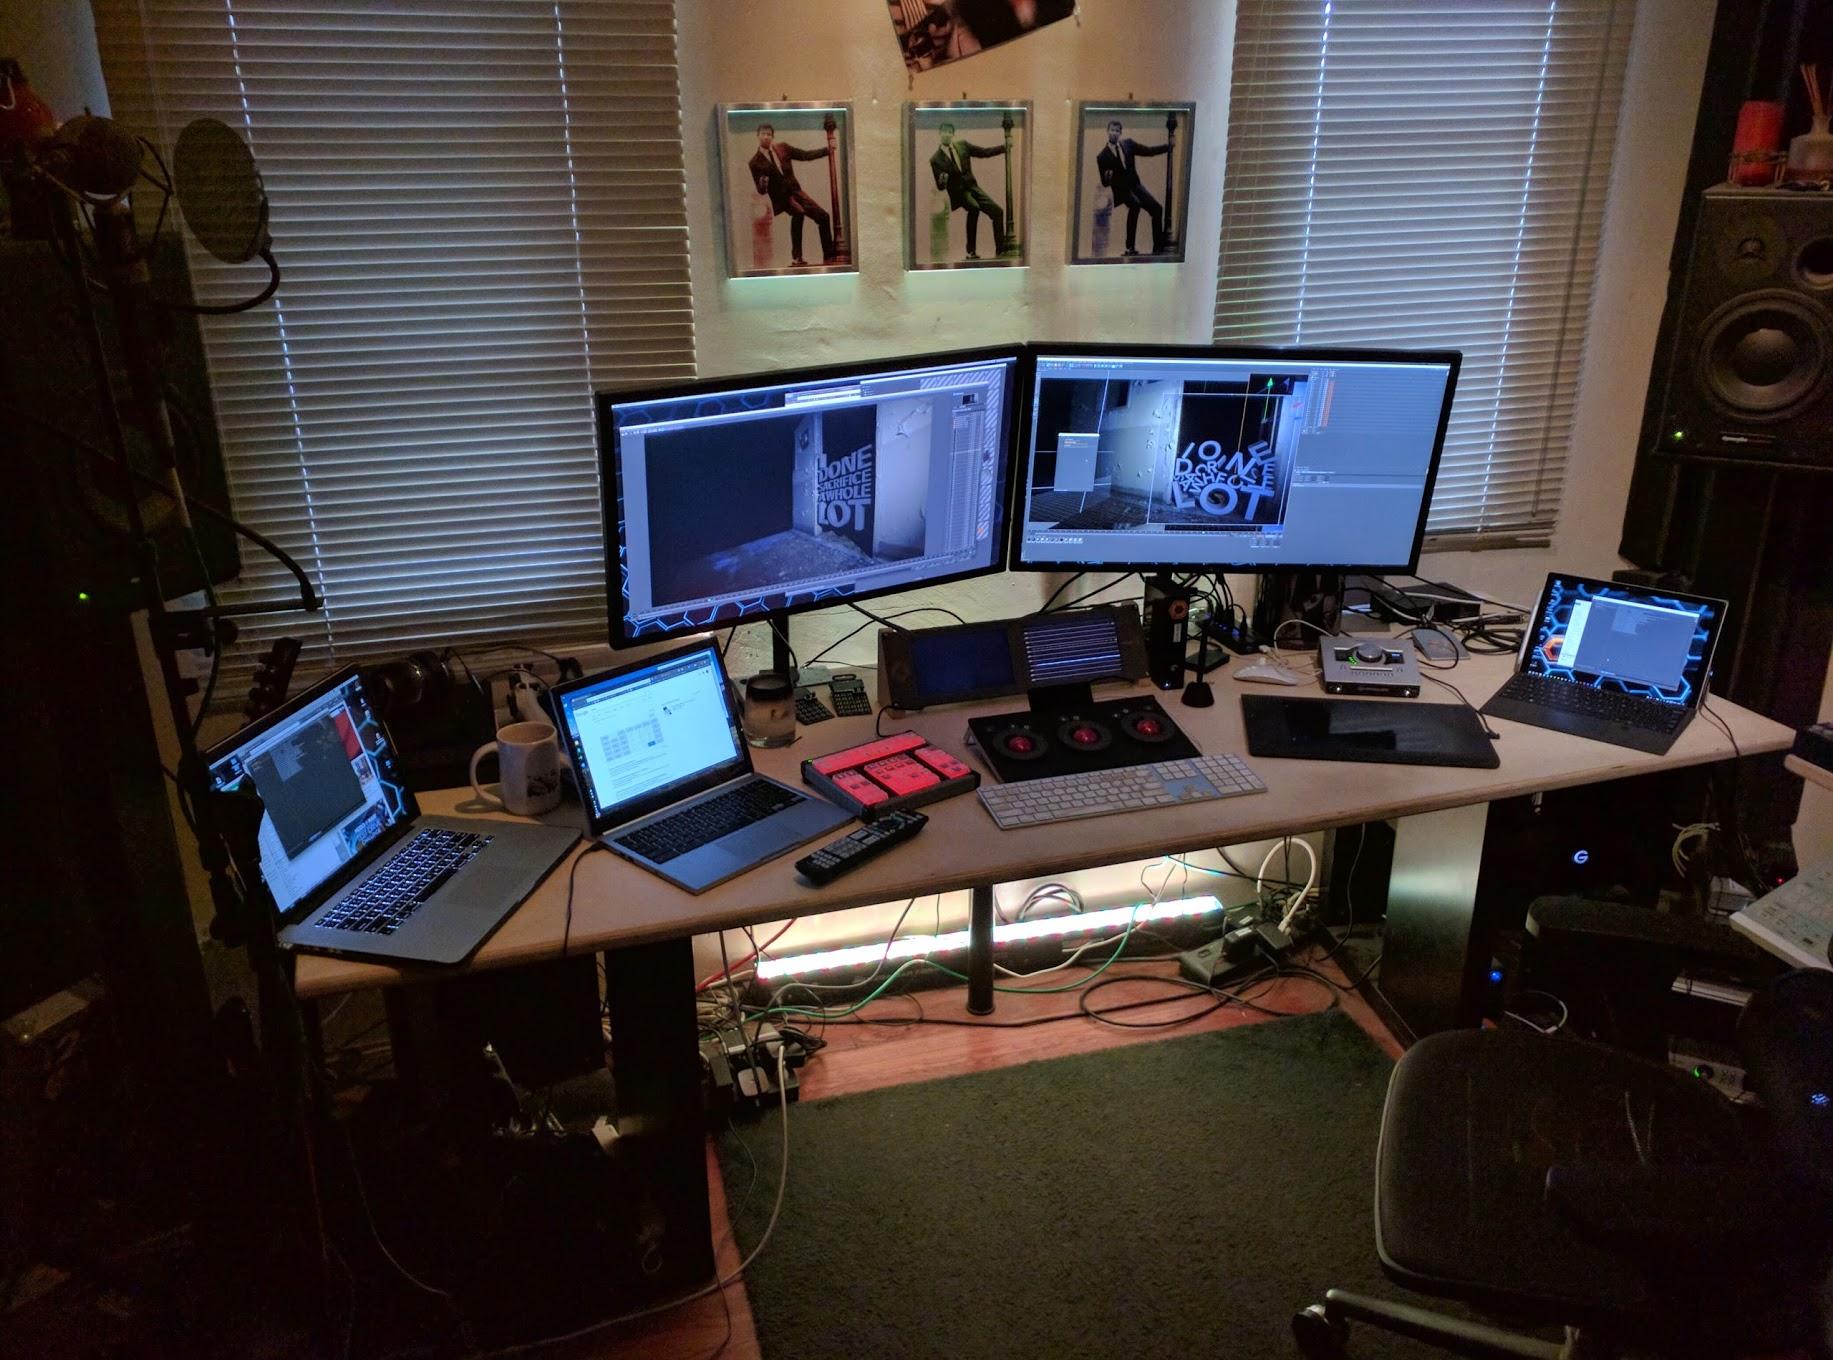 DEM computing platform agnosticism in full effect on the 'Sacrifice' teaser project.